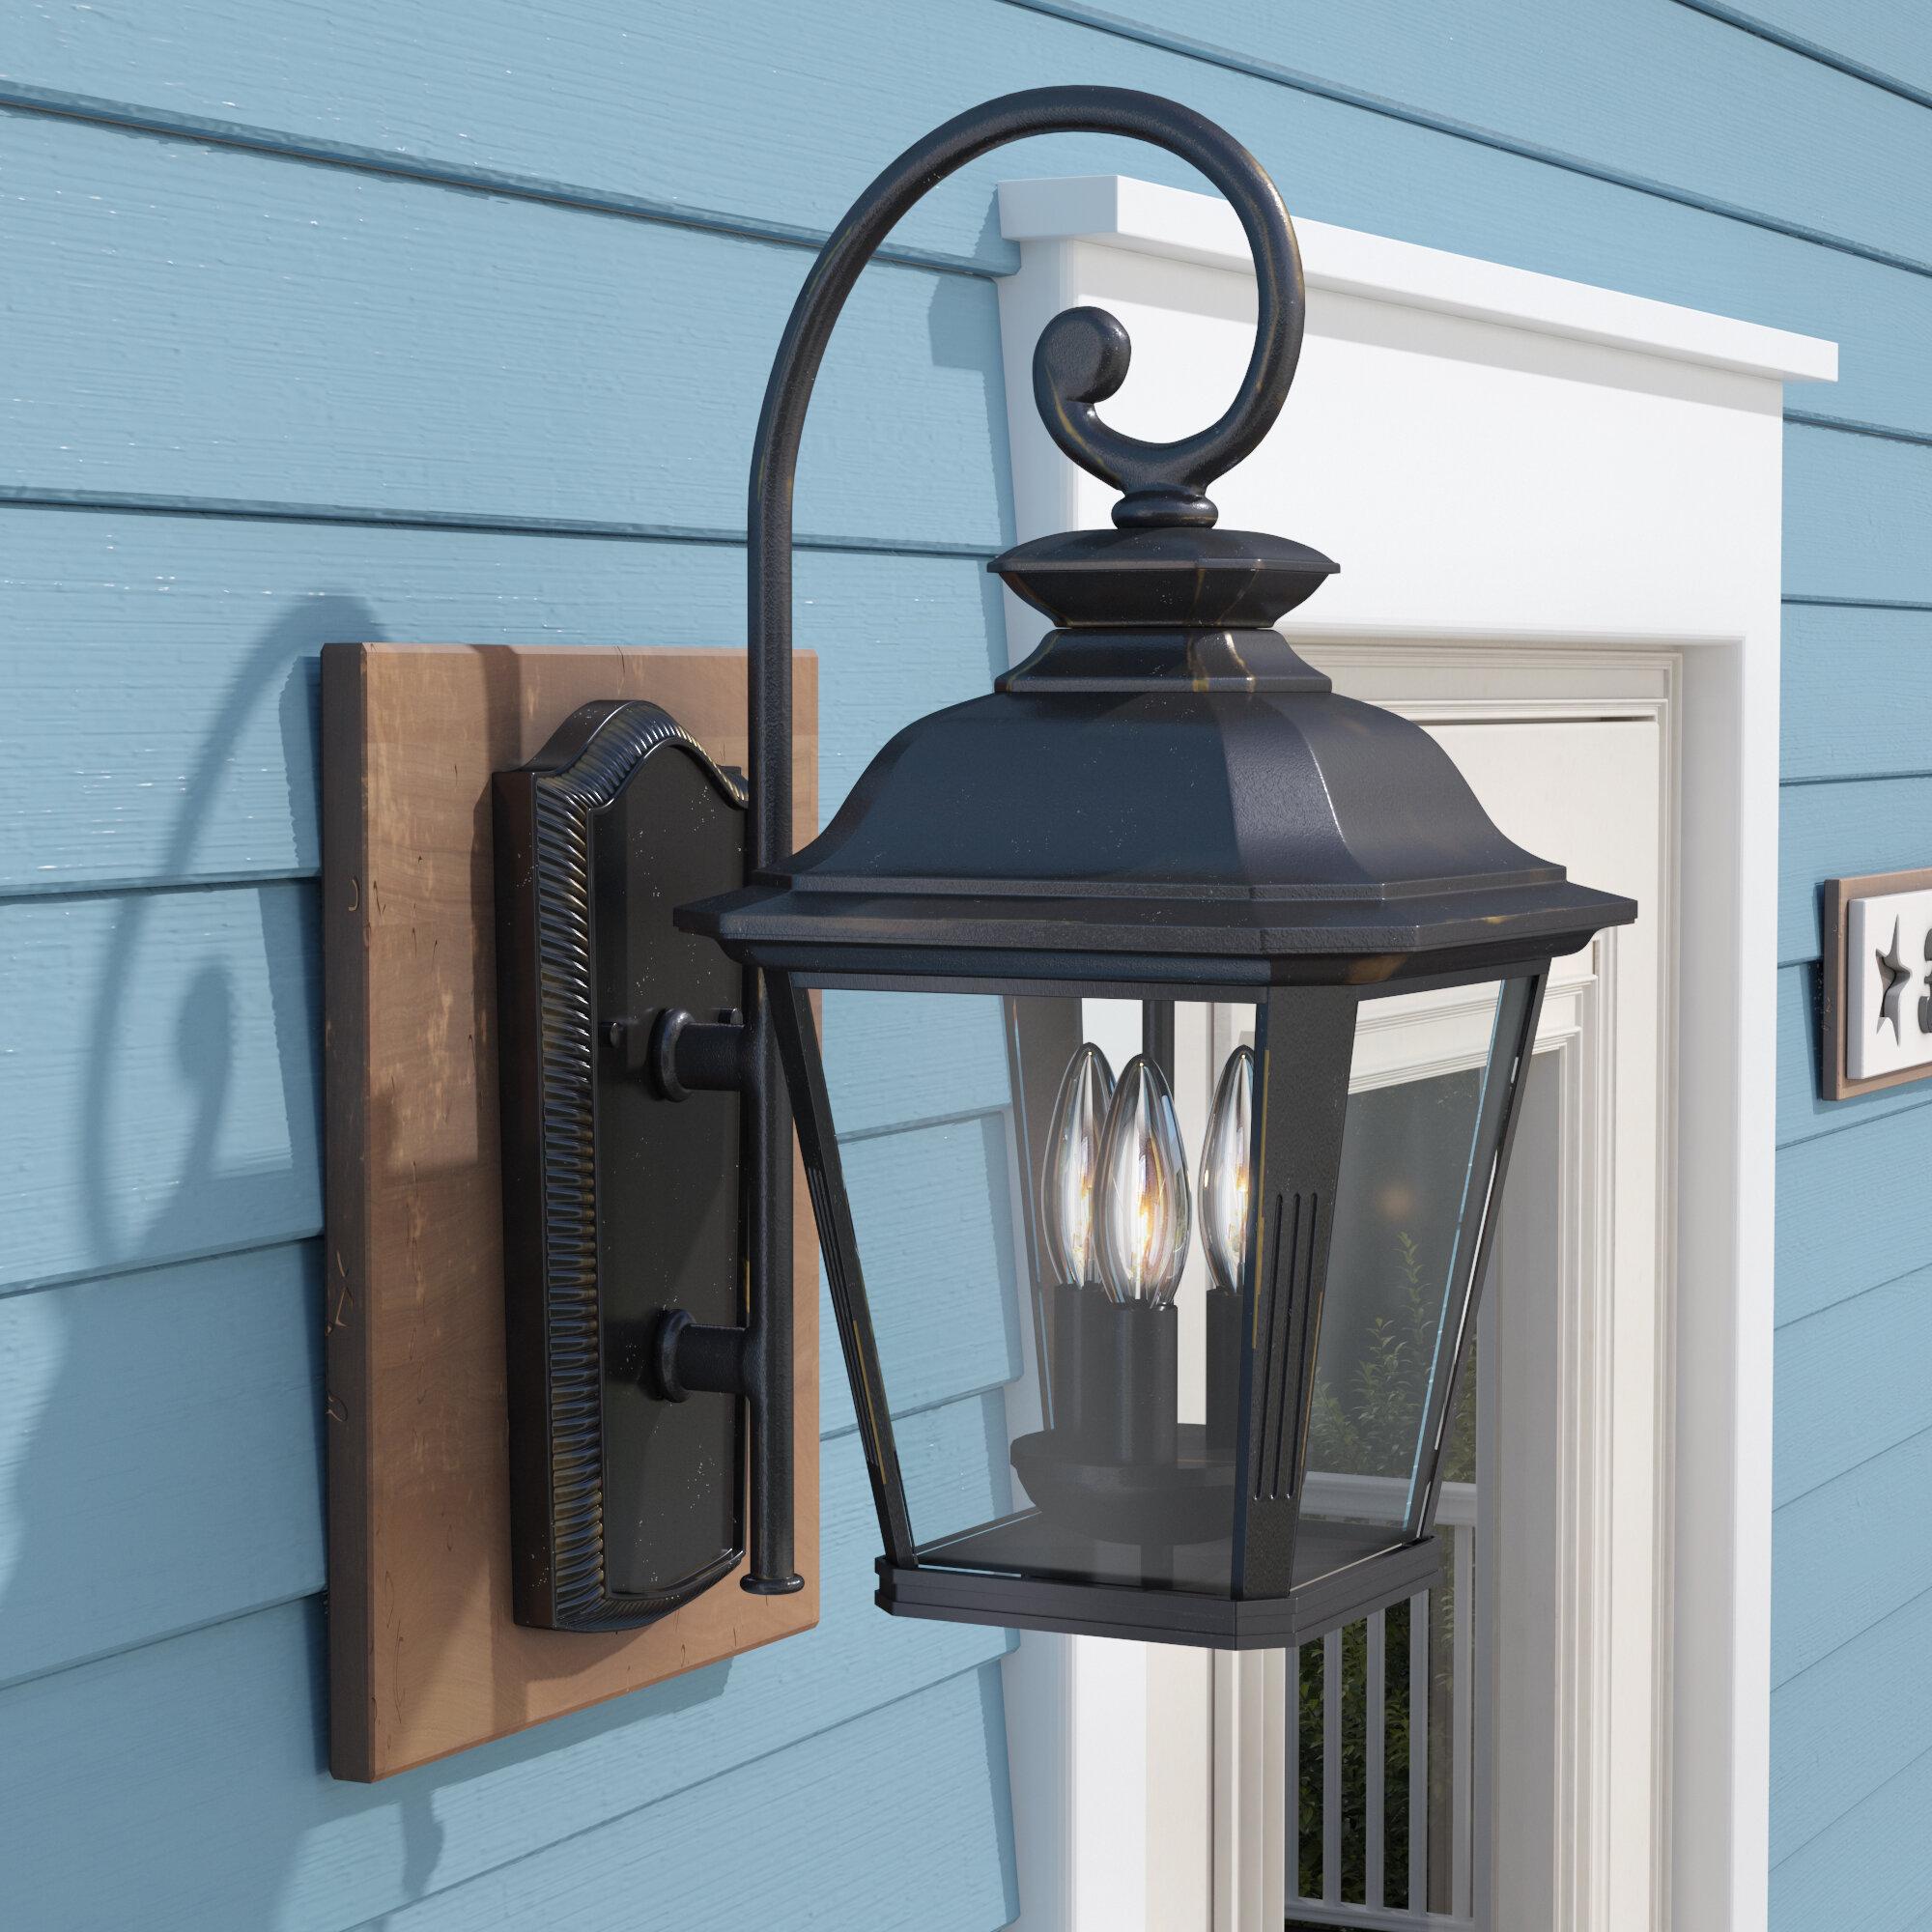 Darby Home Co Sunbury 3-Light Outdoor Wall Lantern | Wayfair